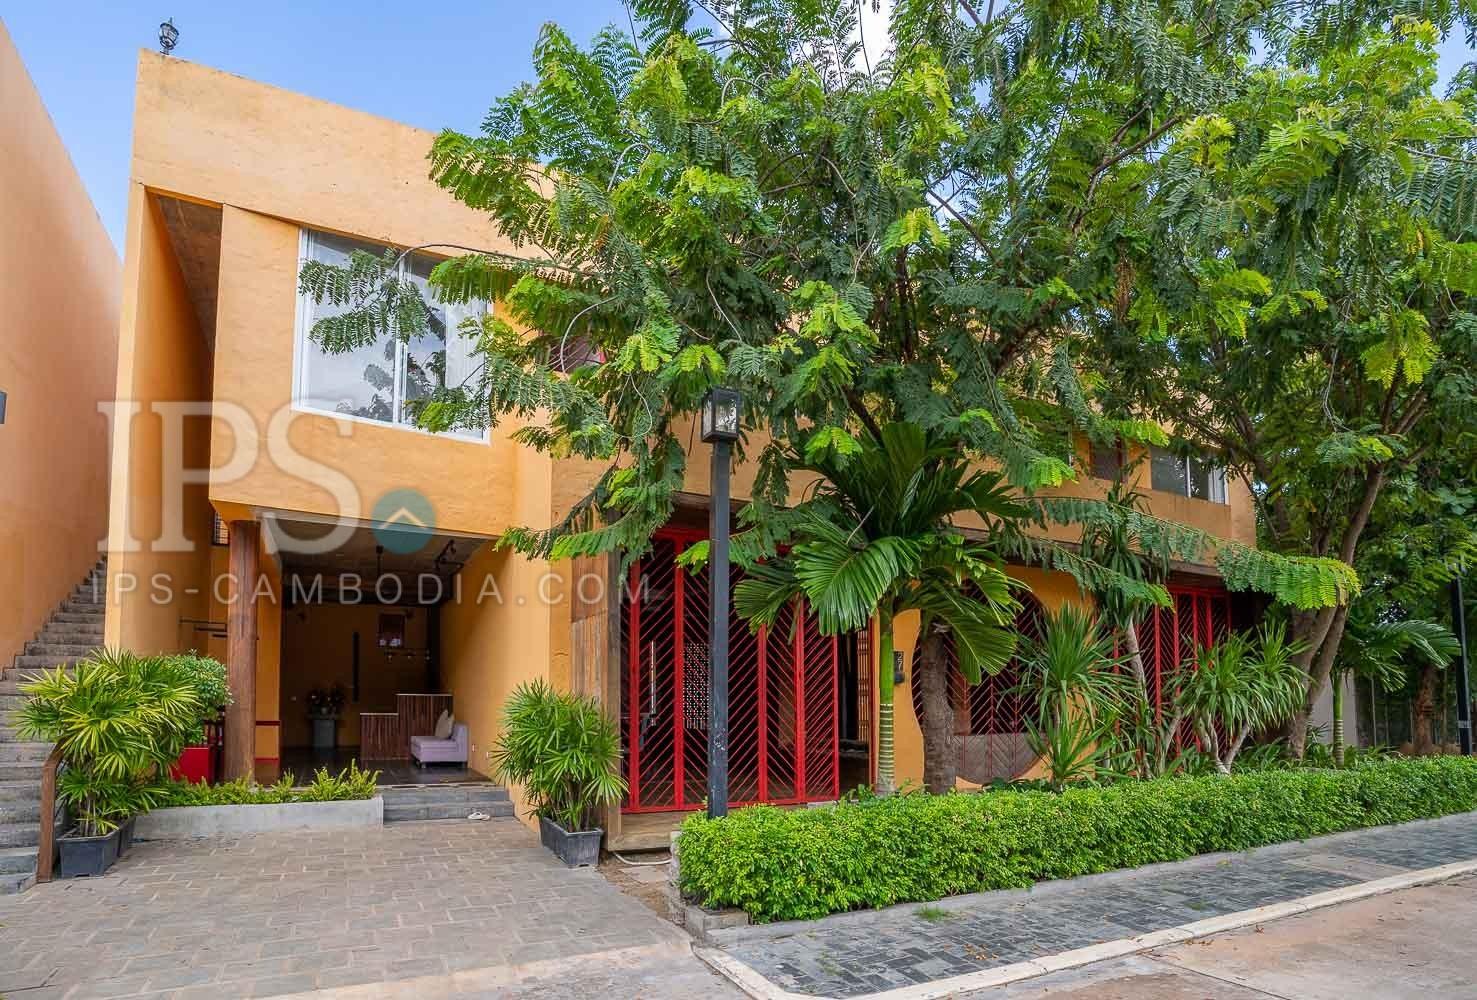 6 Bedroom Villa For Rent - Sra Ngae, Siem Reap